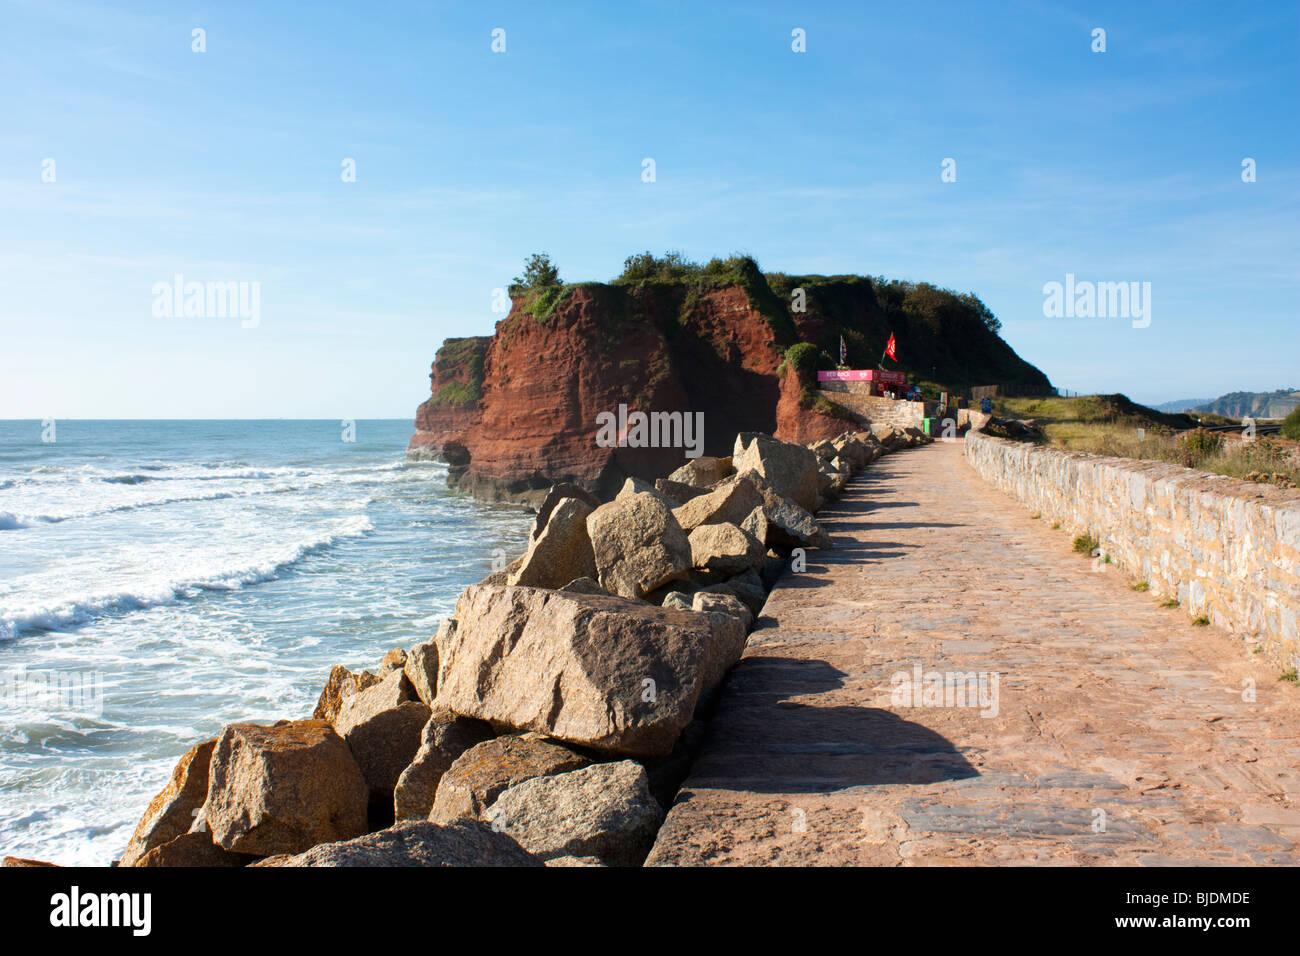 Langstone Rock, Red Rock Beach, Dawlish England UK - Stock Image